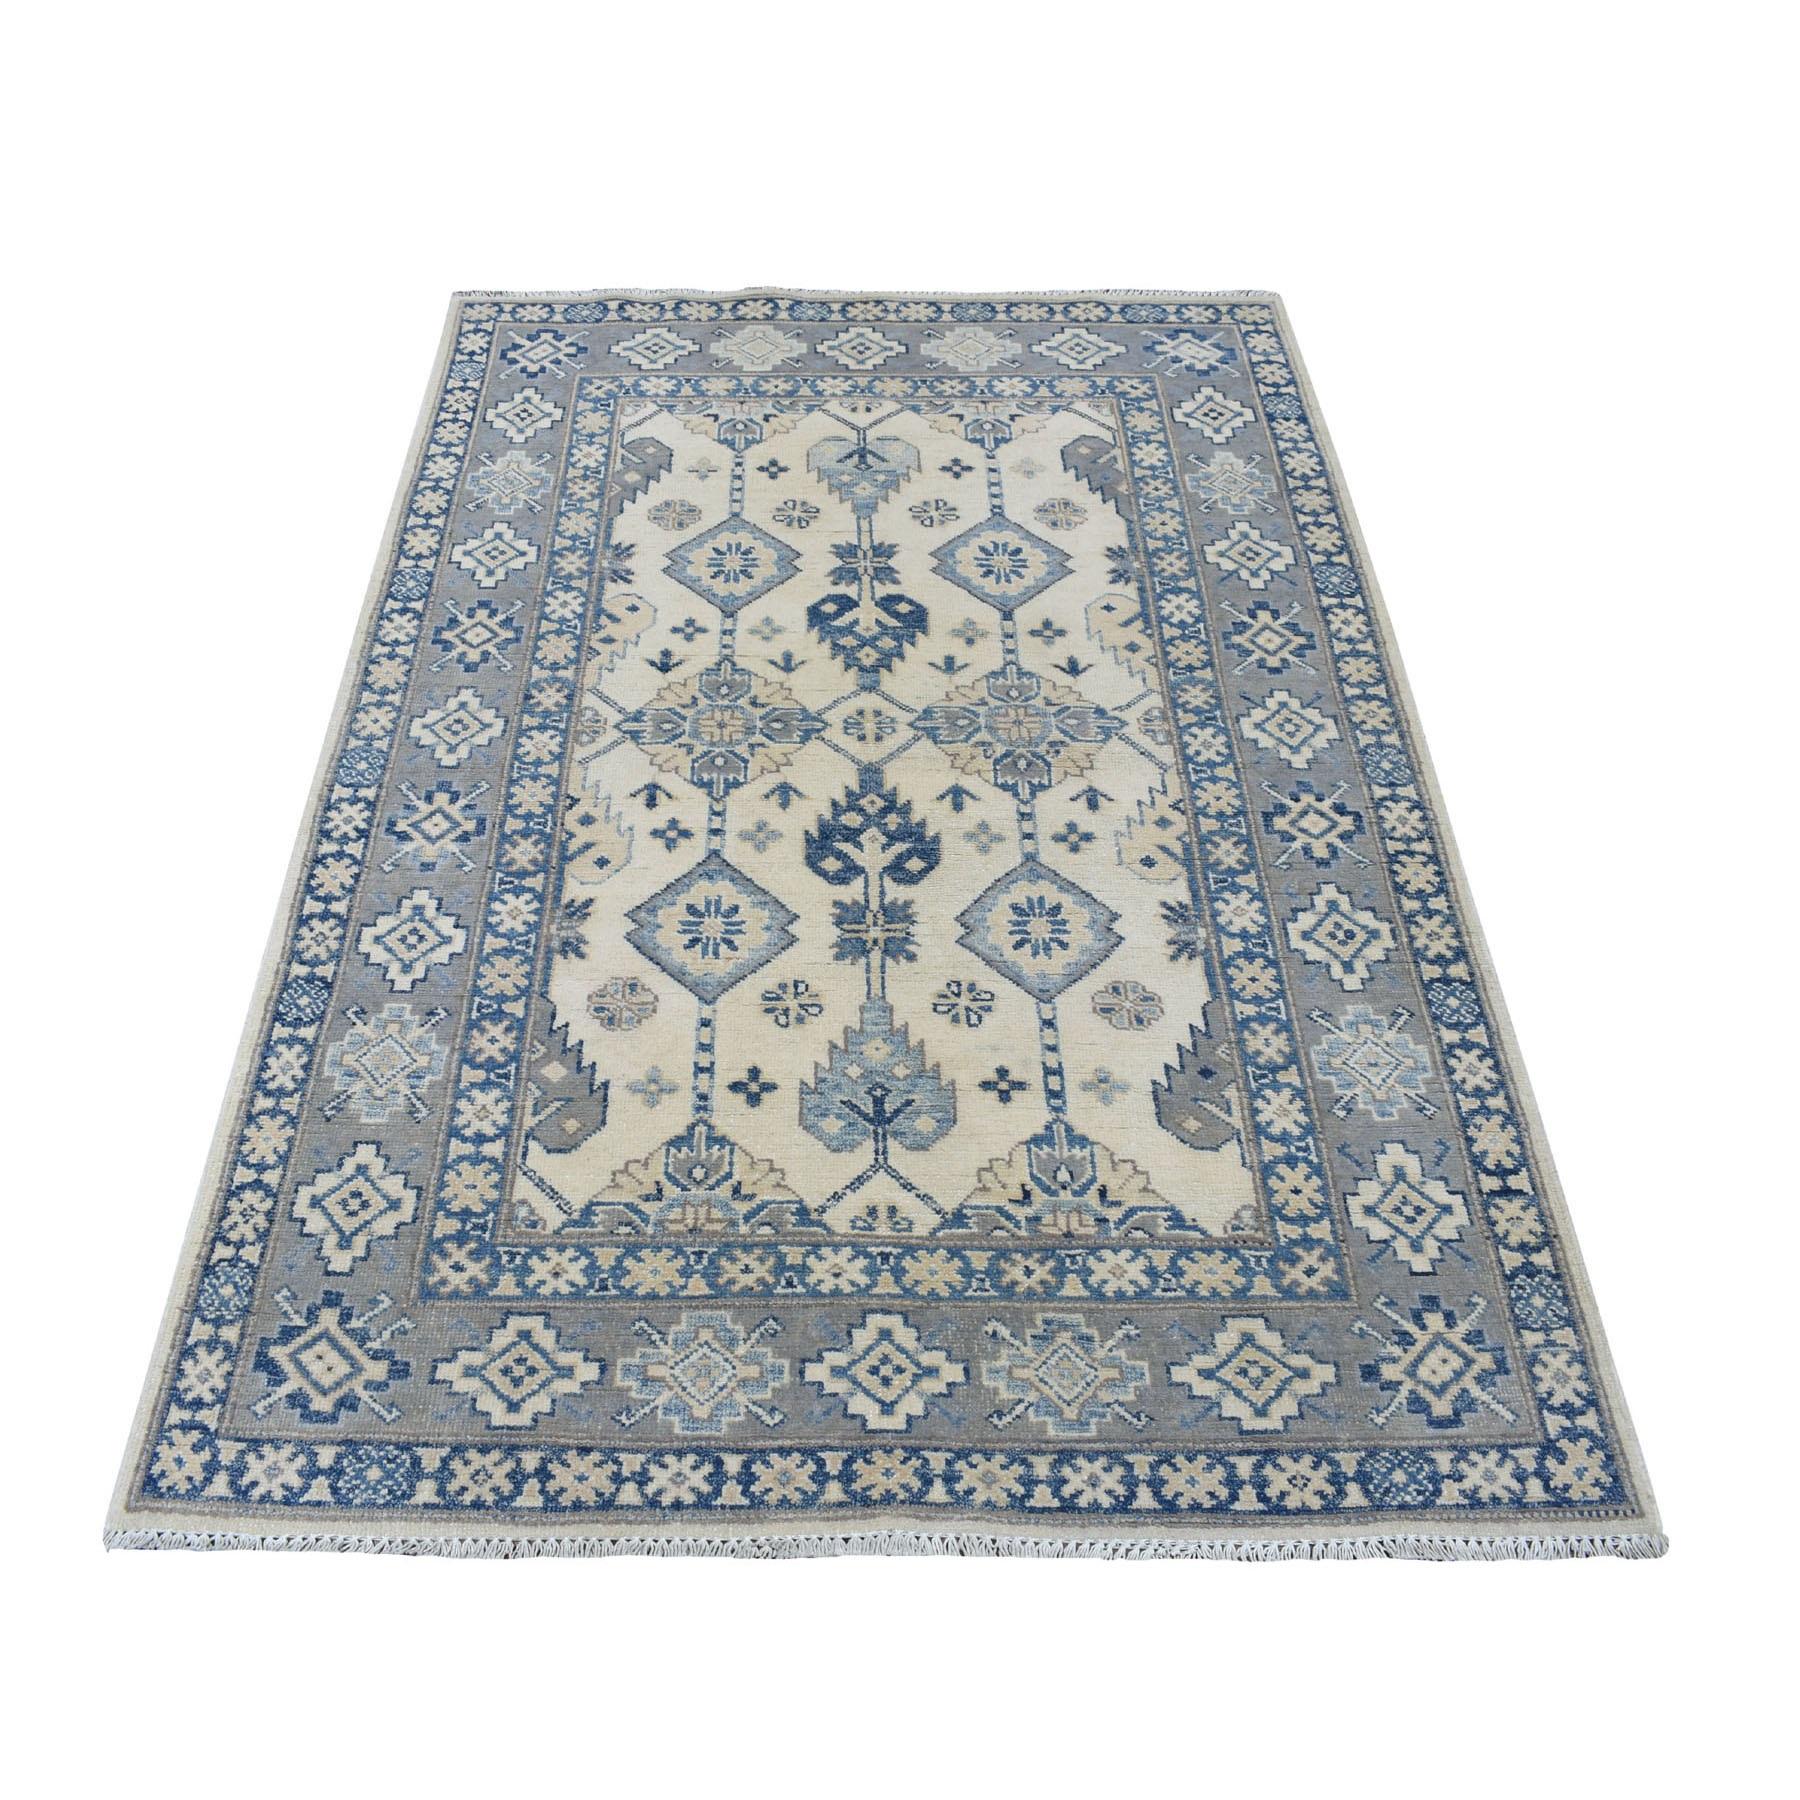 "3'10""X5'10"" Ivory Afghan Vintage Look Kazak Tribal Design Hand Knotted Pure Wool Oriental Rug moaed8ec"